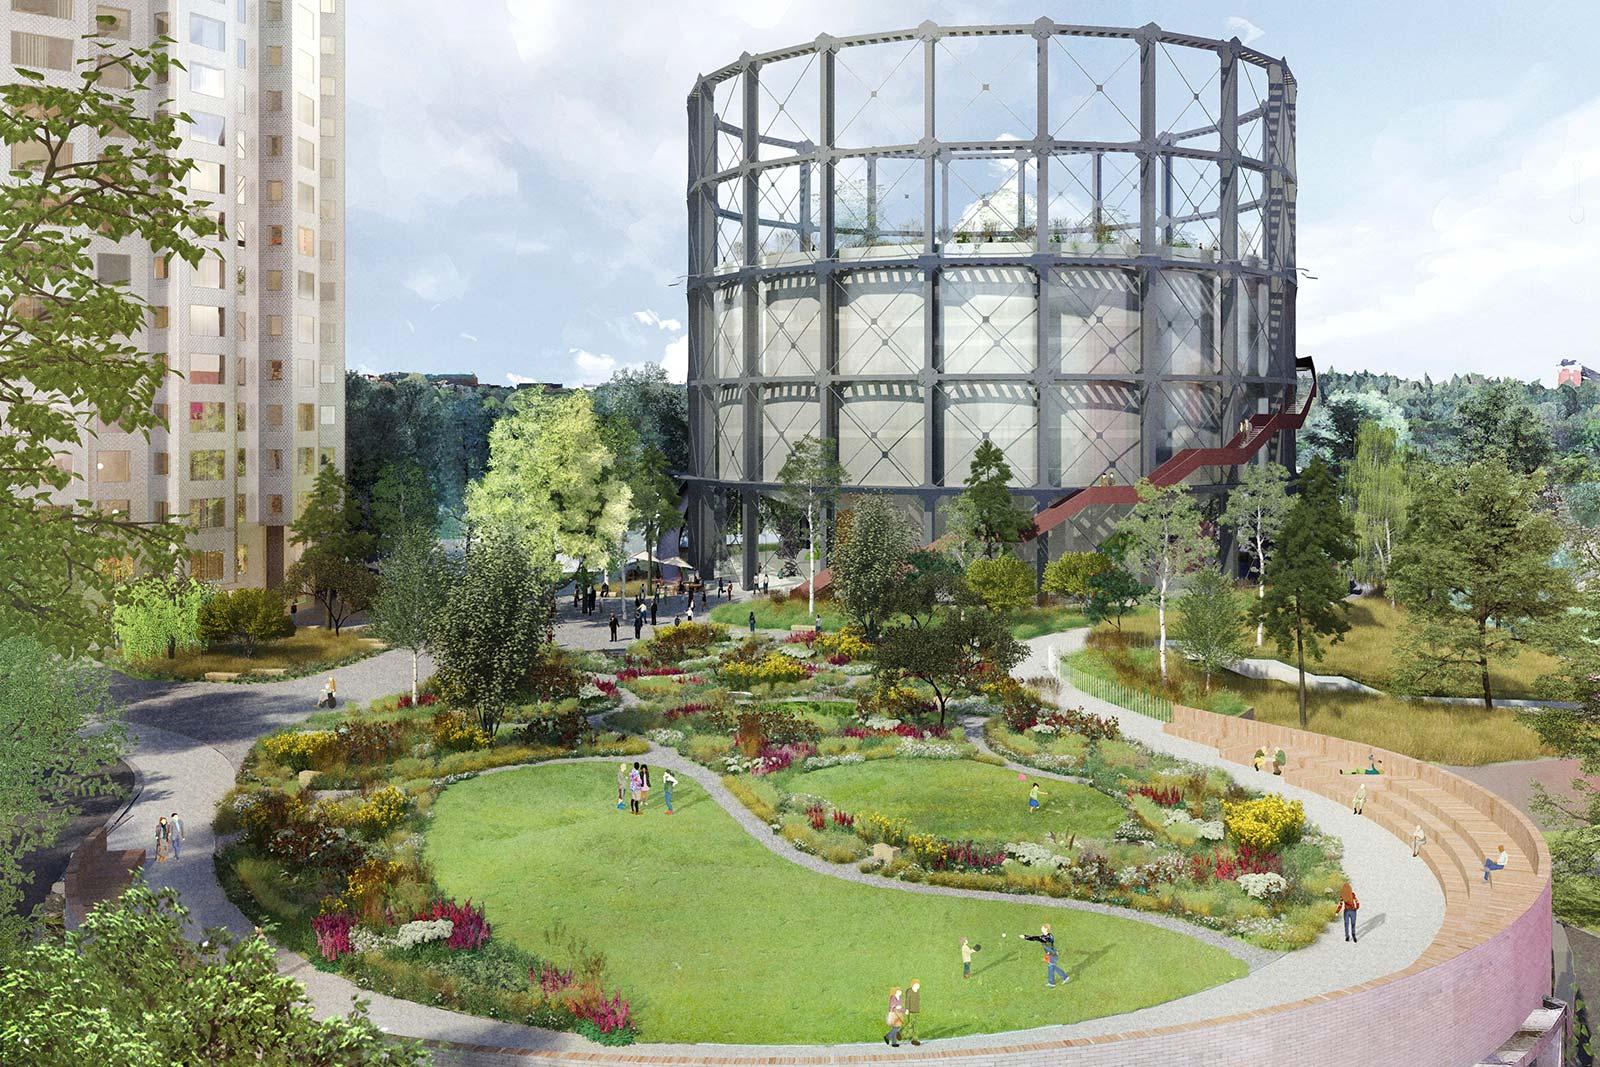 Gasklockan in stockholm landscape design by piet oudolf for Piet oudolf landscape architect